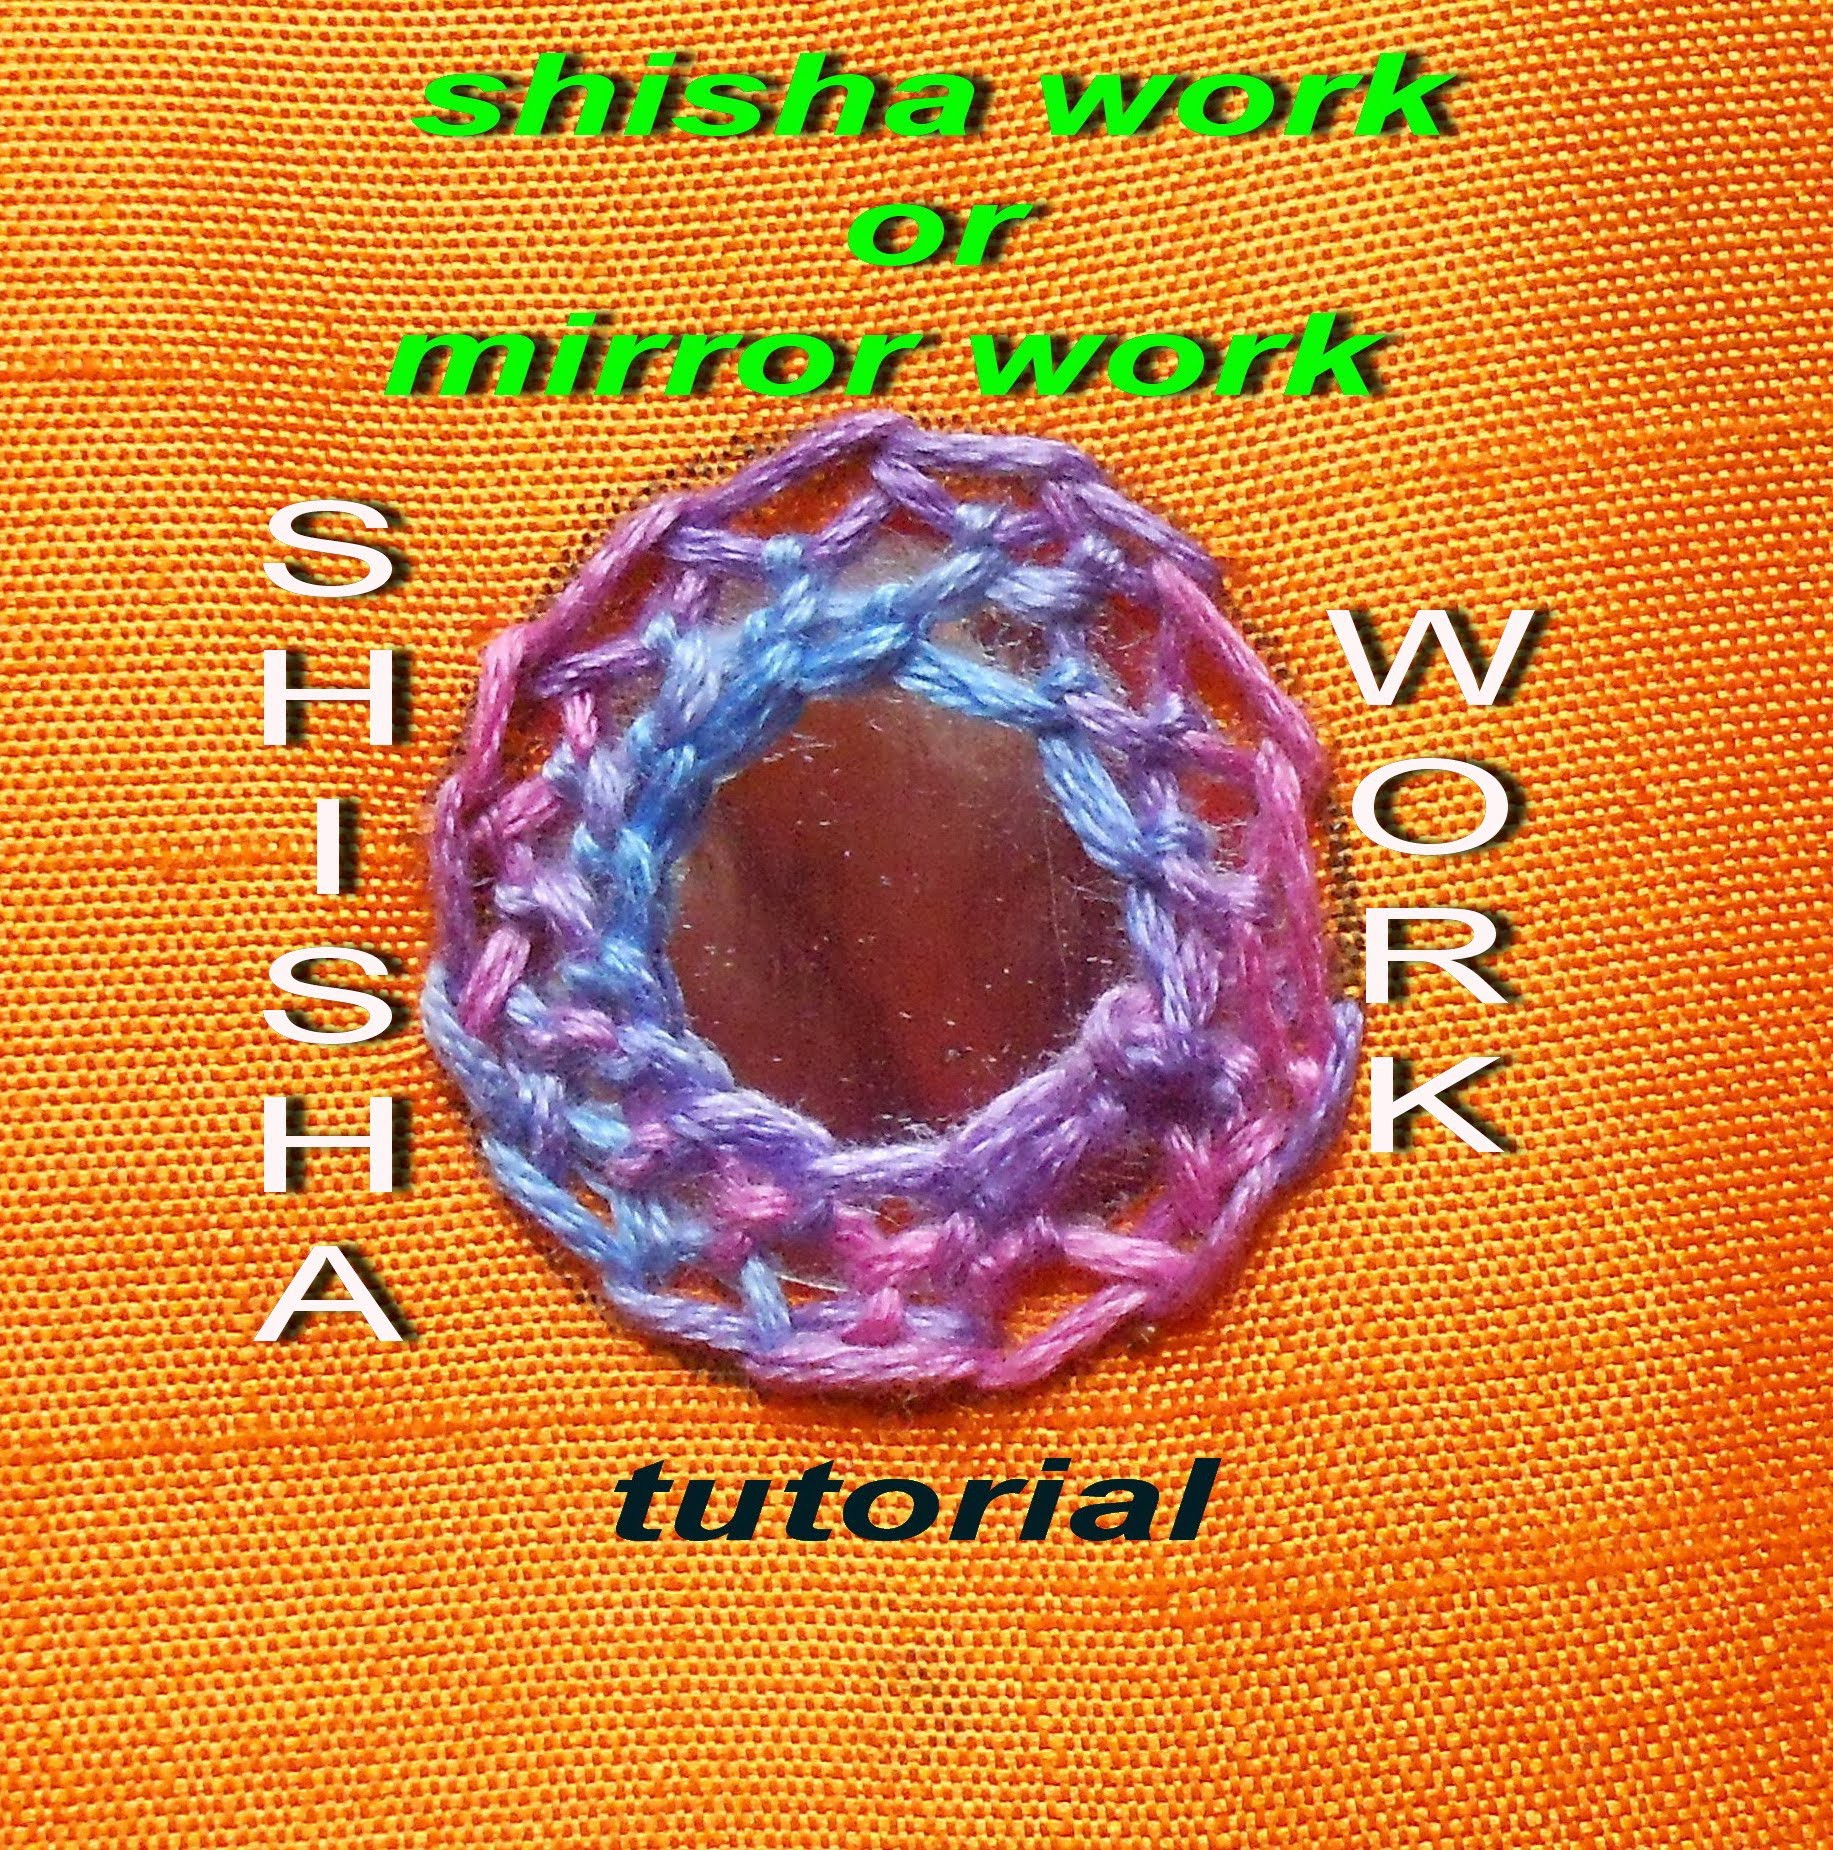 HAND EMBROIDERY: SHISHA  OR MIRROR WORK USING CHAIN STITCH